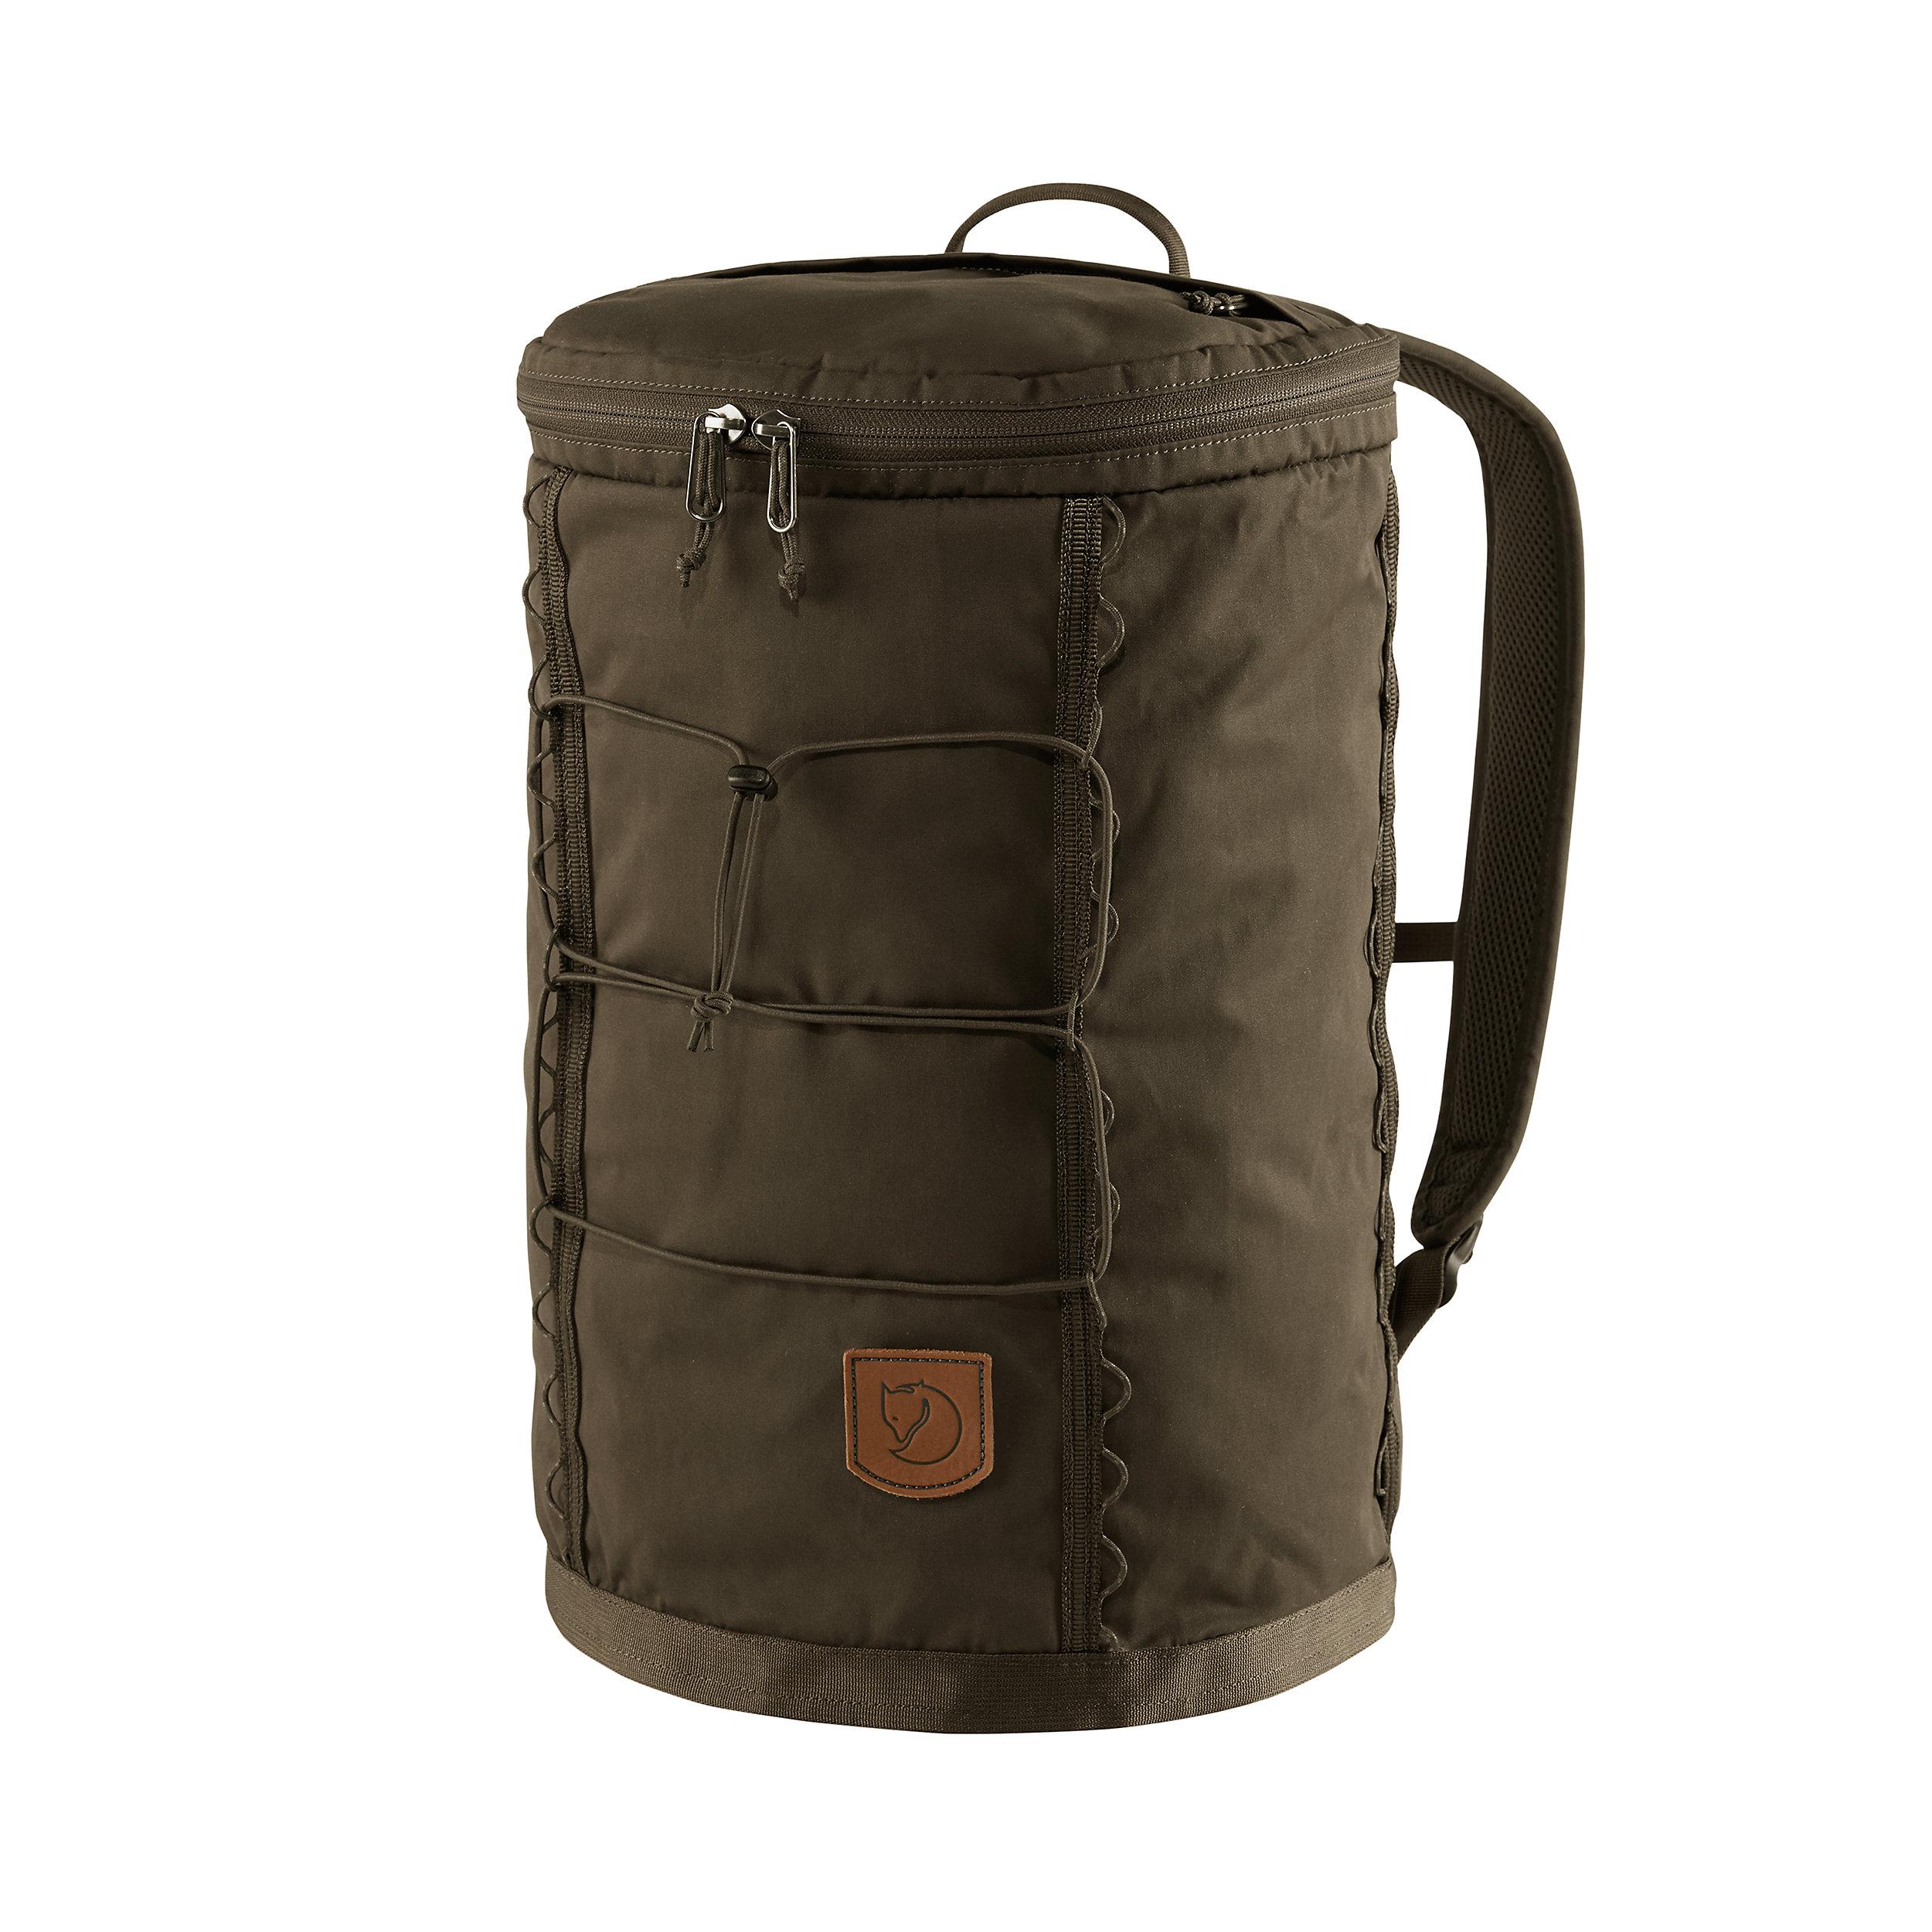 Backpack Singi 20 15 Inch Medium